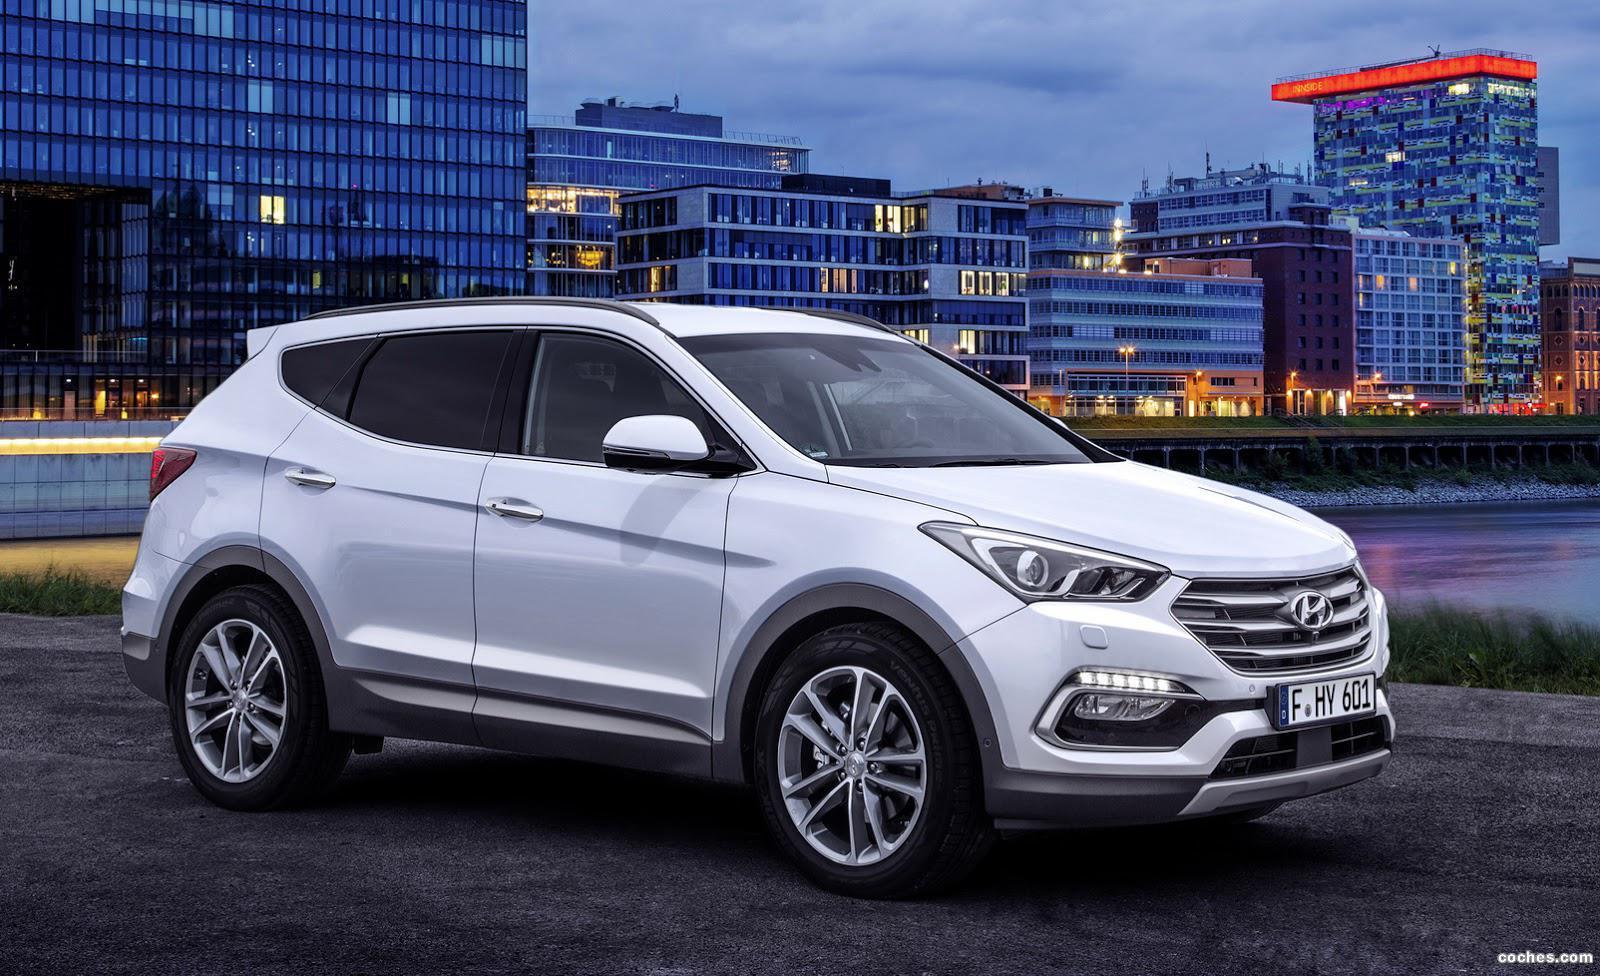 Foto 0 de Hyundai Santa Fe 2015